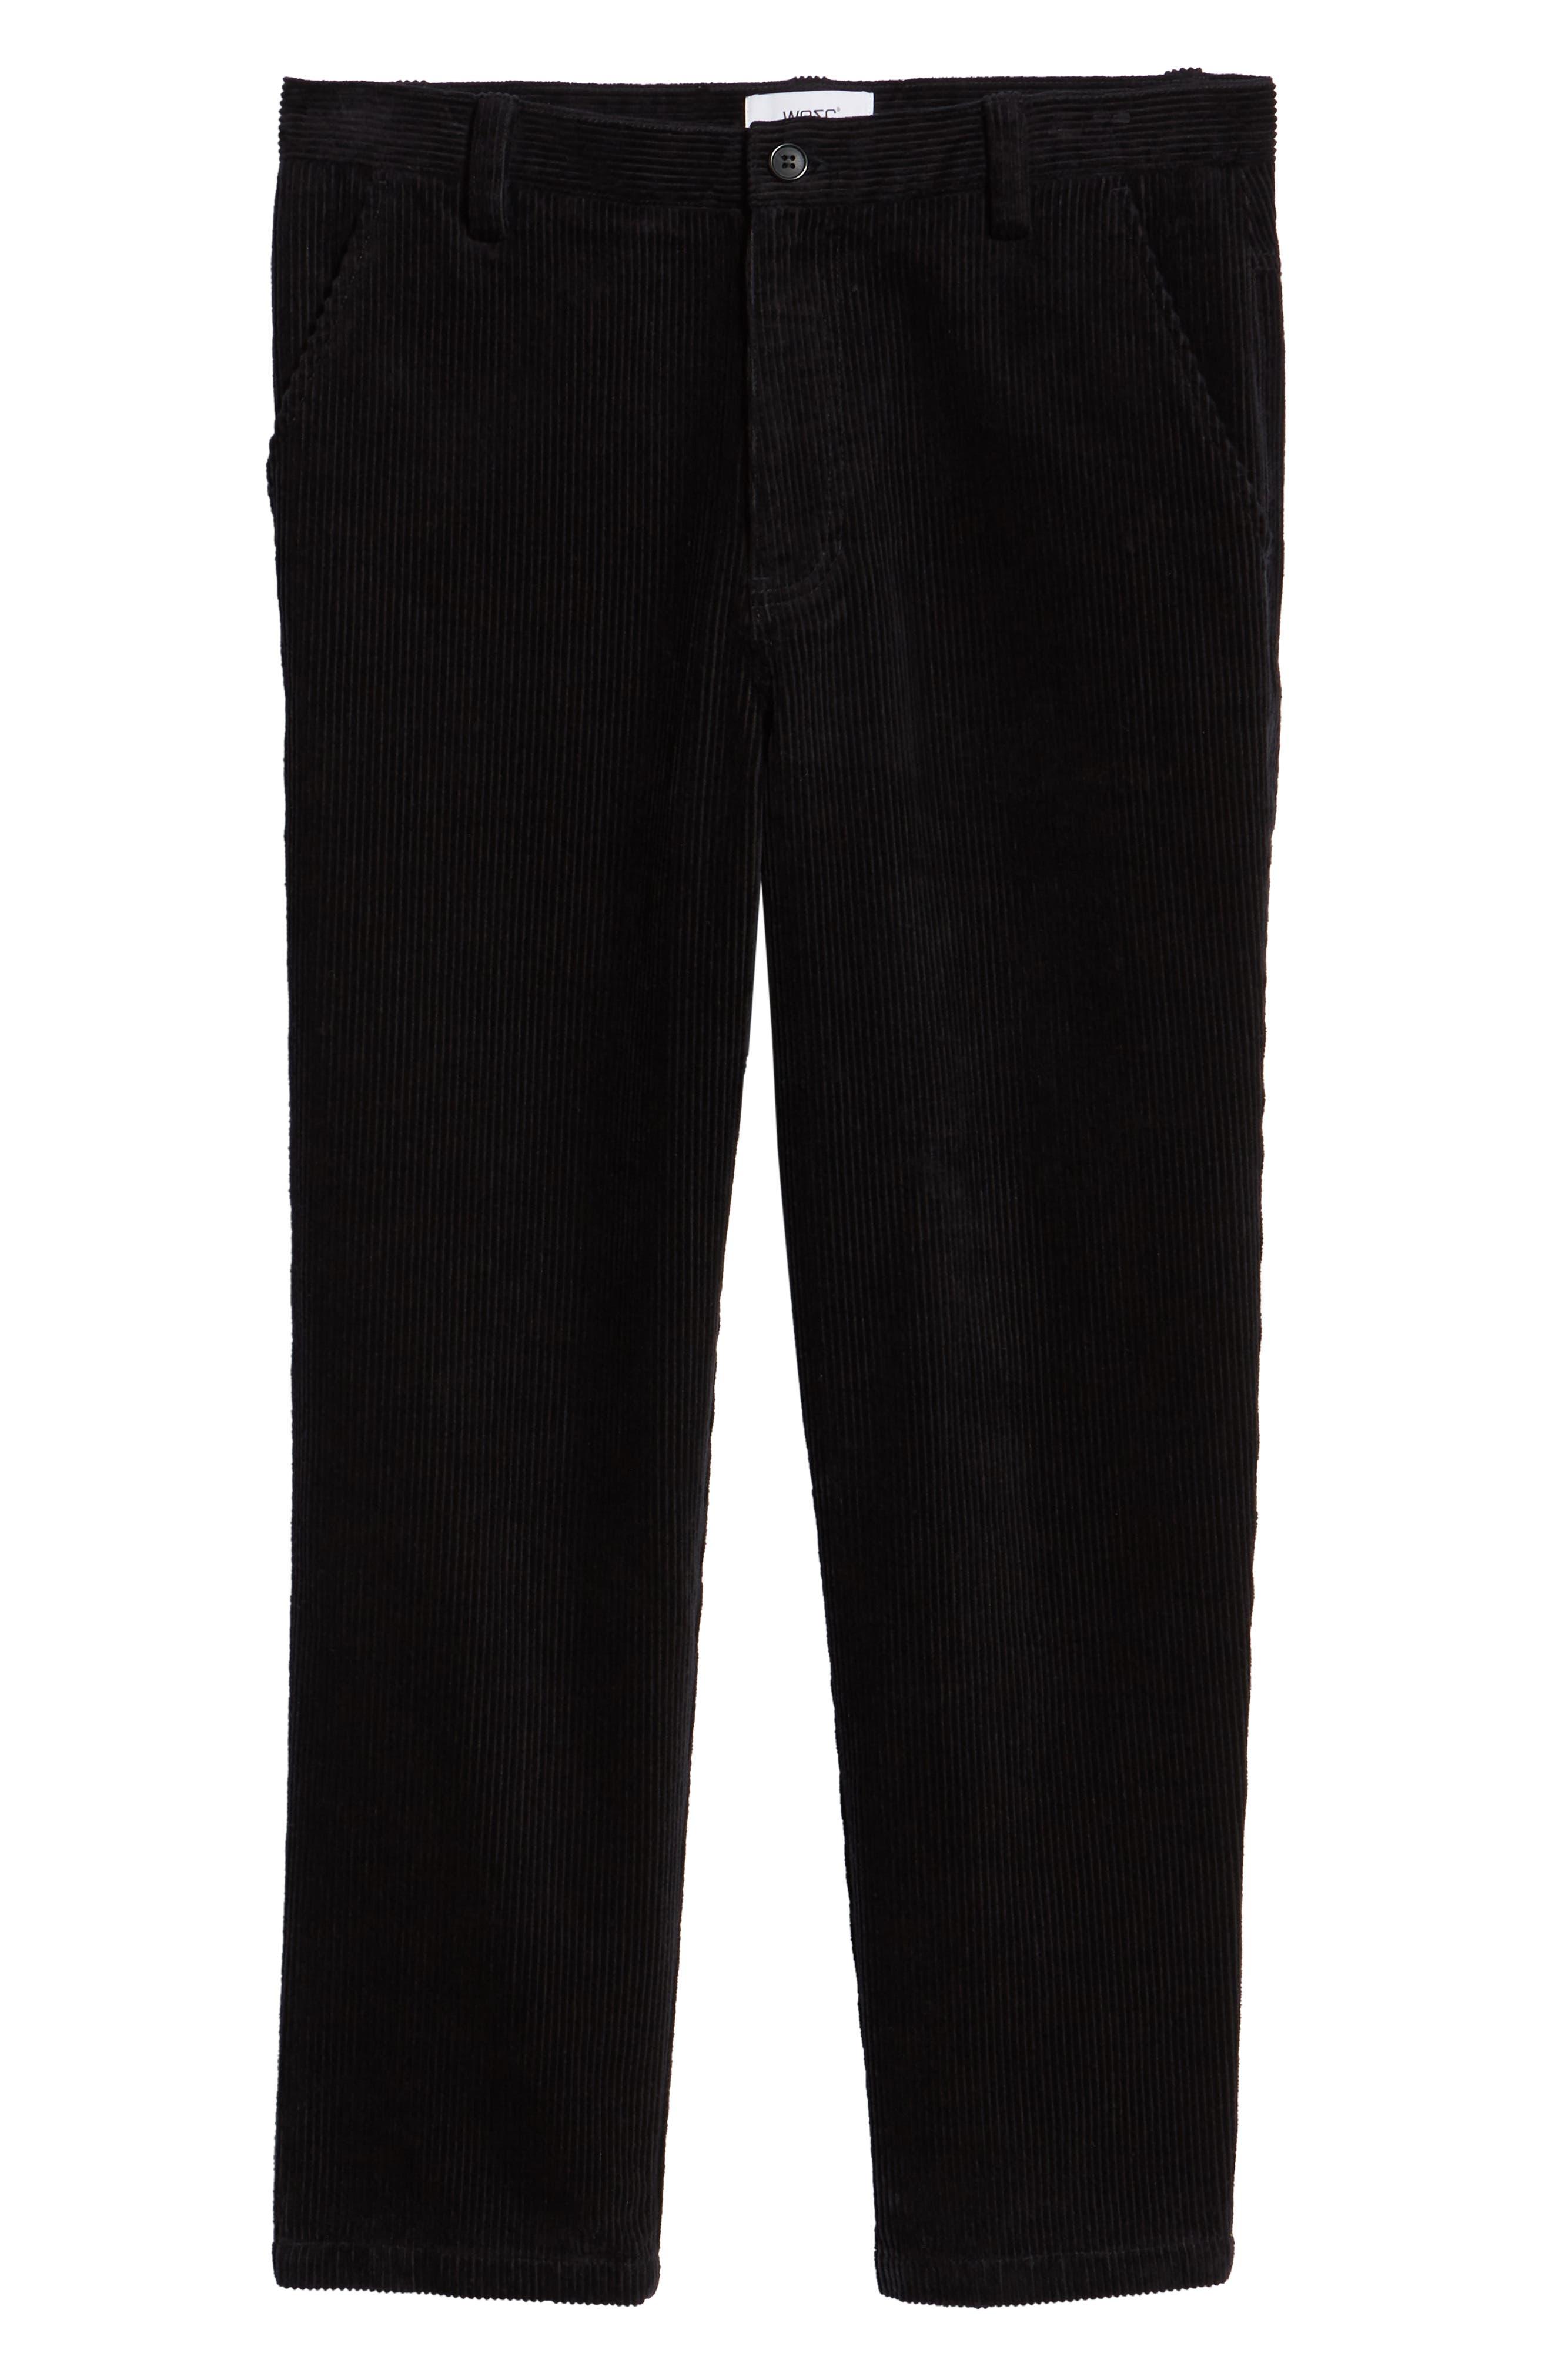 Iggy Wide Wale Cotton Corduroy Straight Leg Pants,                             Alternate thumbnail 6, color,                             BLACK